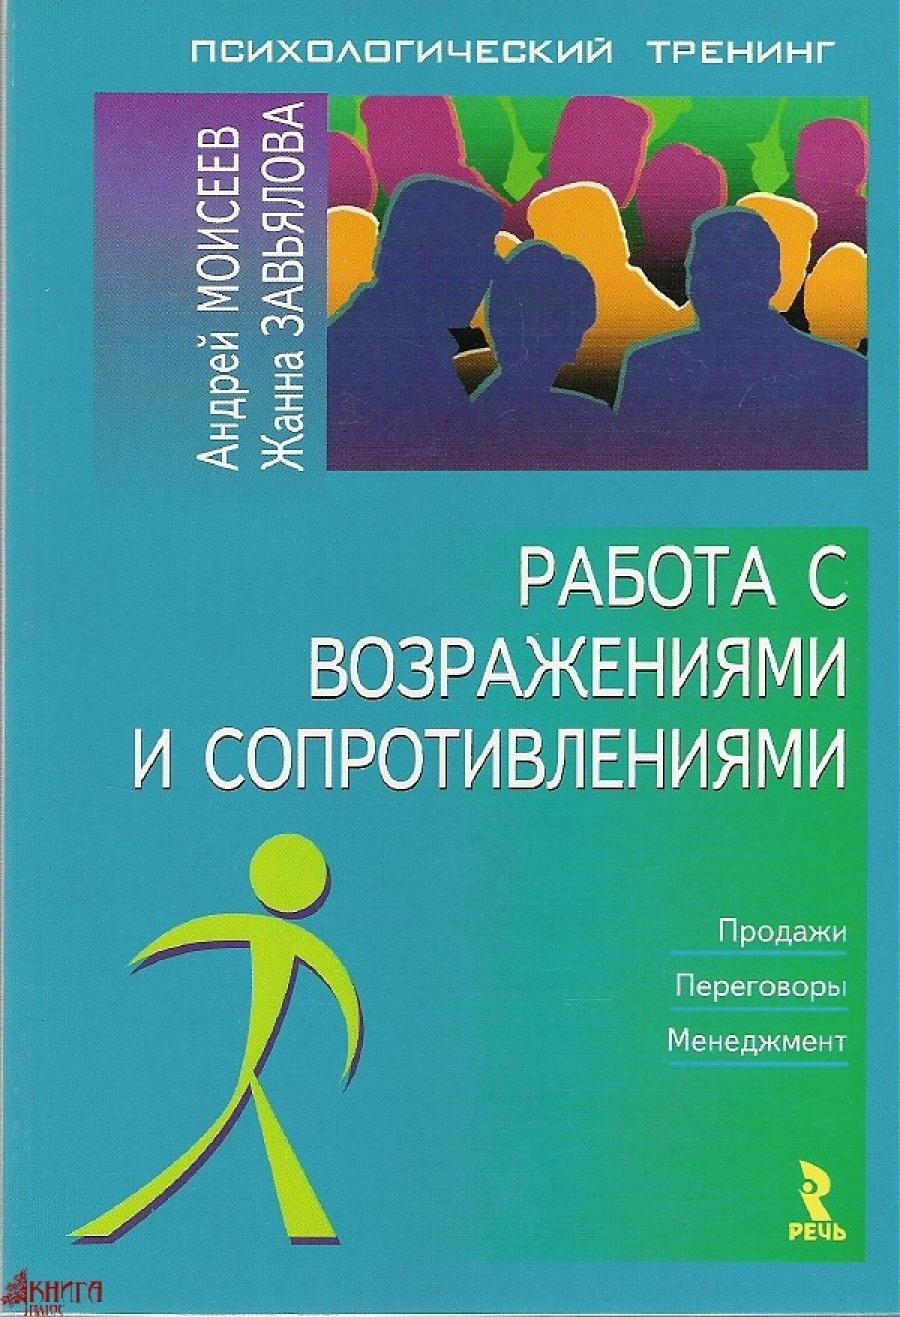 Обложка книги:  моисеев а. а. , завьялова ж. в. - работа с возражениями и сопротивлениями